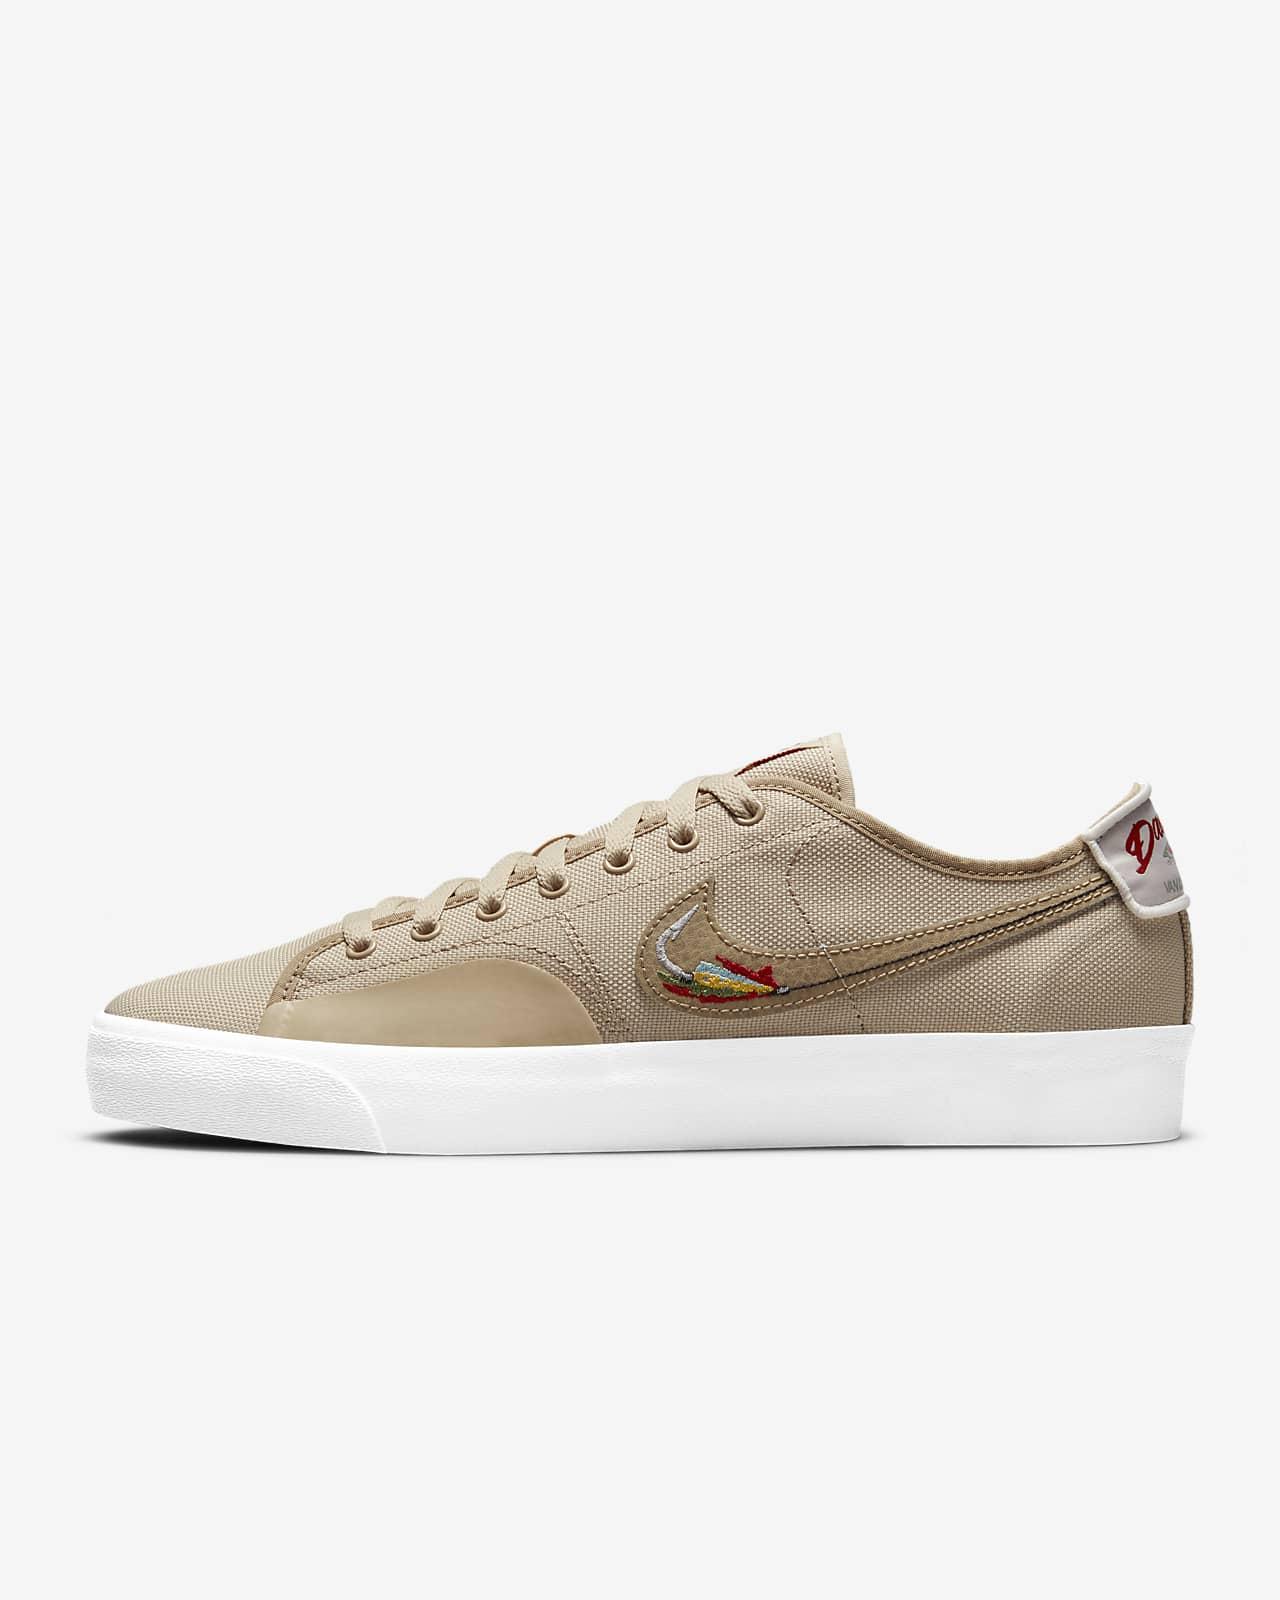 Nike SB BLZR Court DVDL 滑板鞋